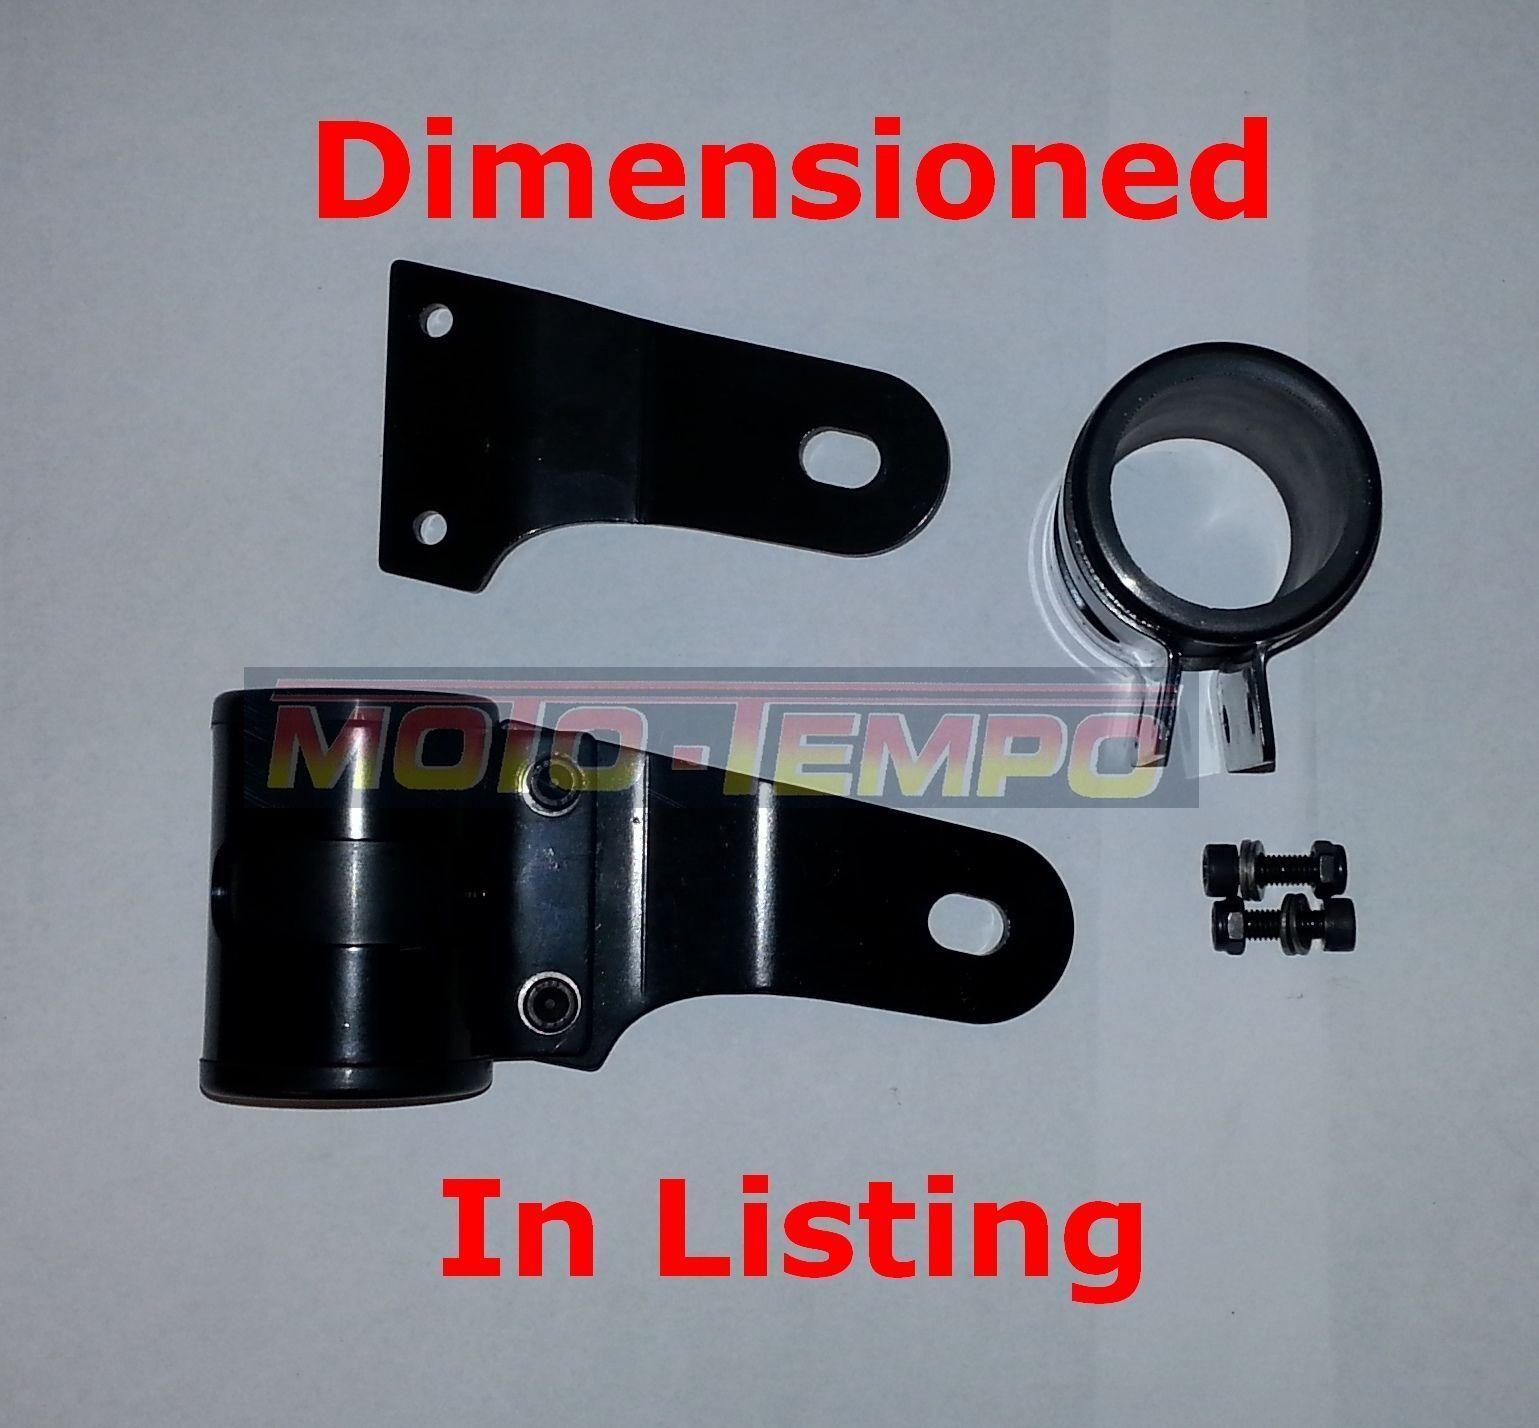 Black headlight bracket to fit USD forks 50mm 51mm 52mm 53mm motorcycle cafe